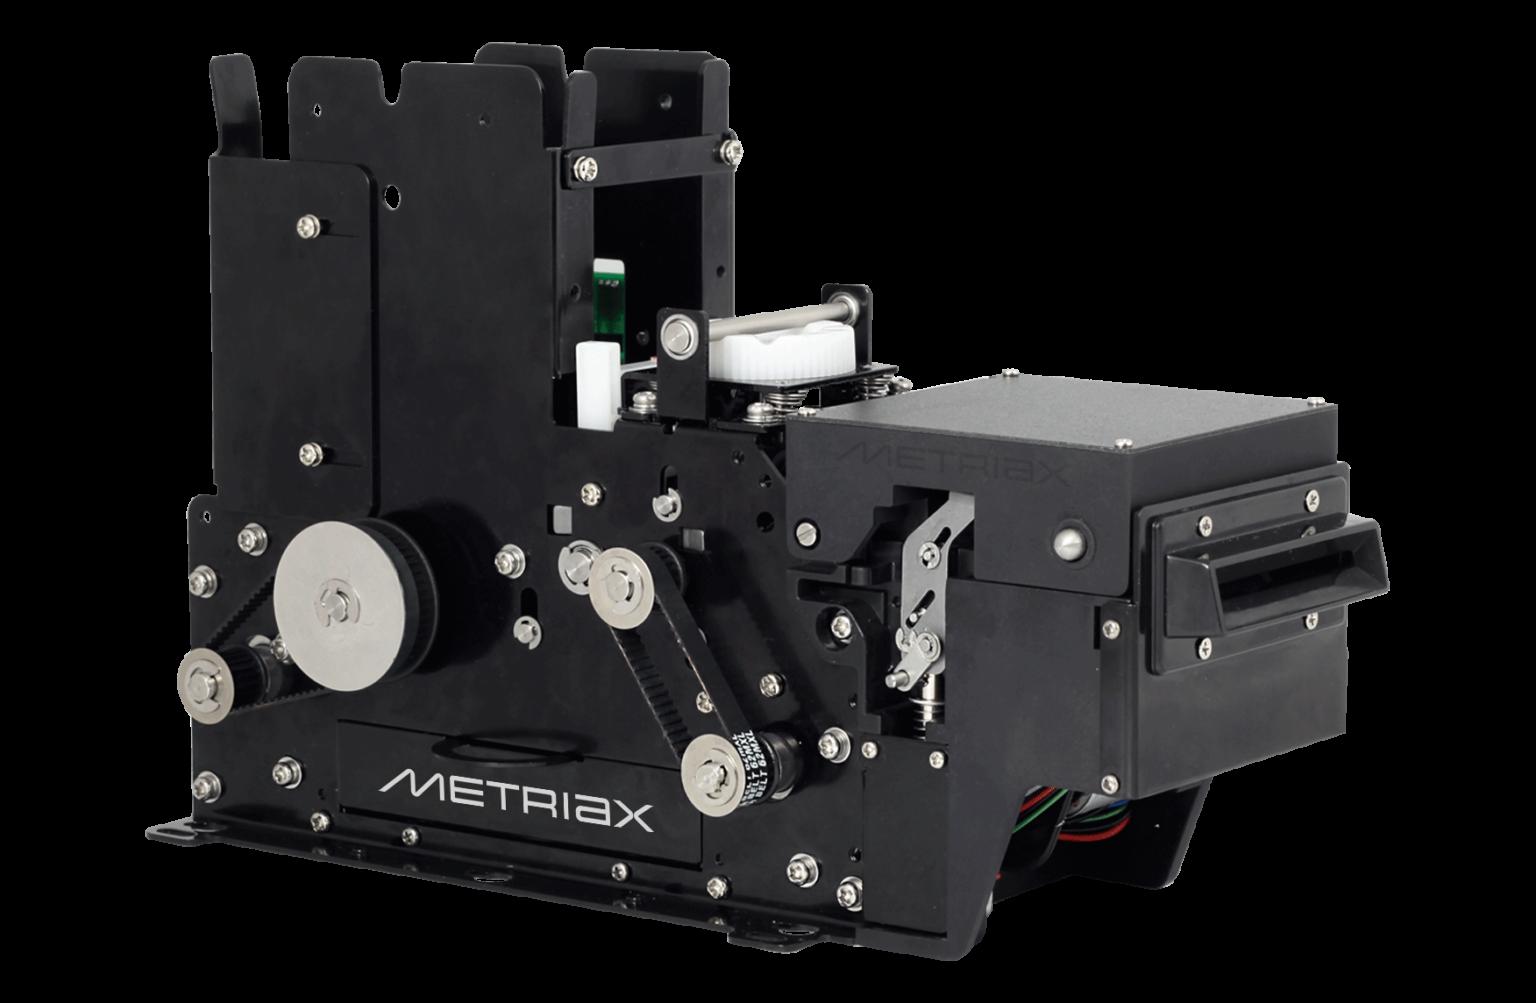 MCR 571 Motorkartenleser-Kartenspender-analog Quio QCR 571-Metriax